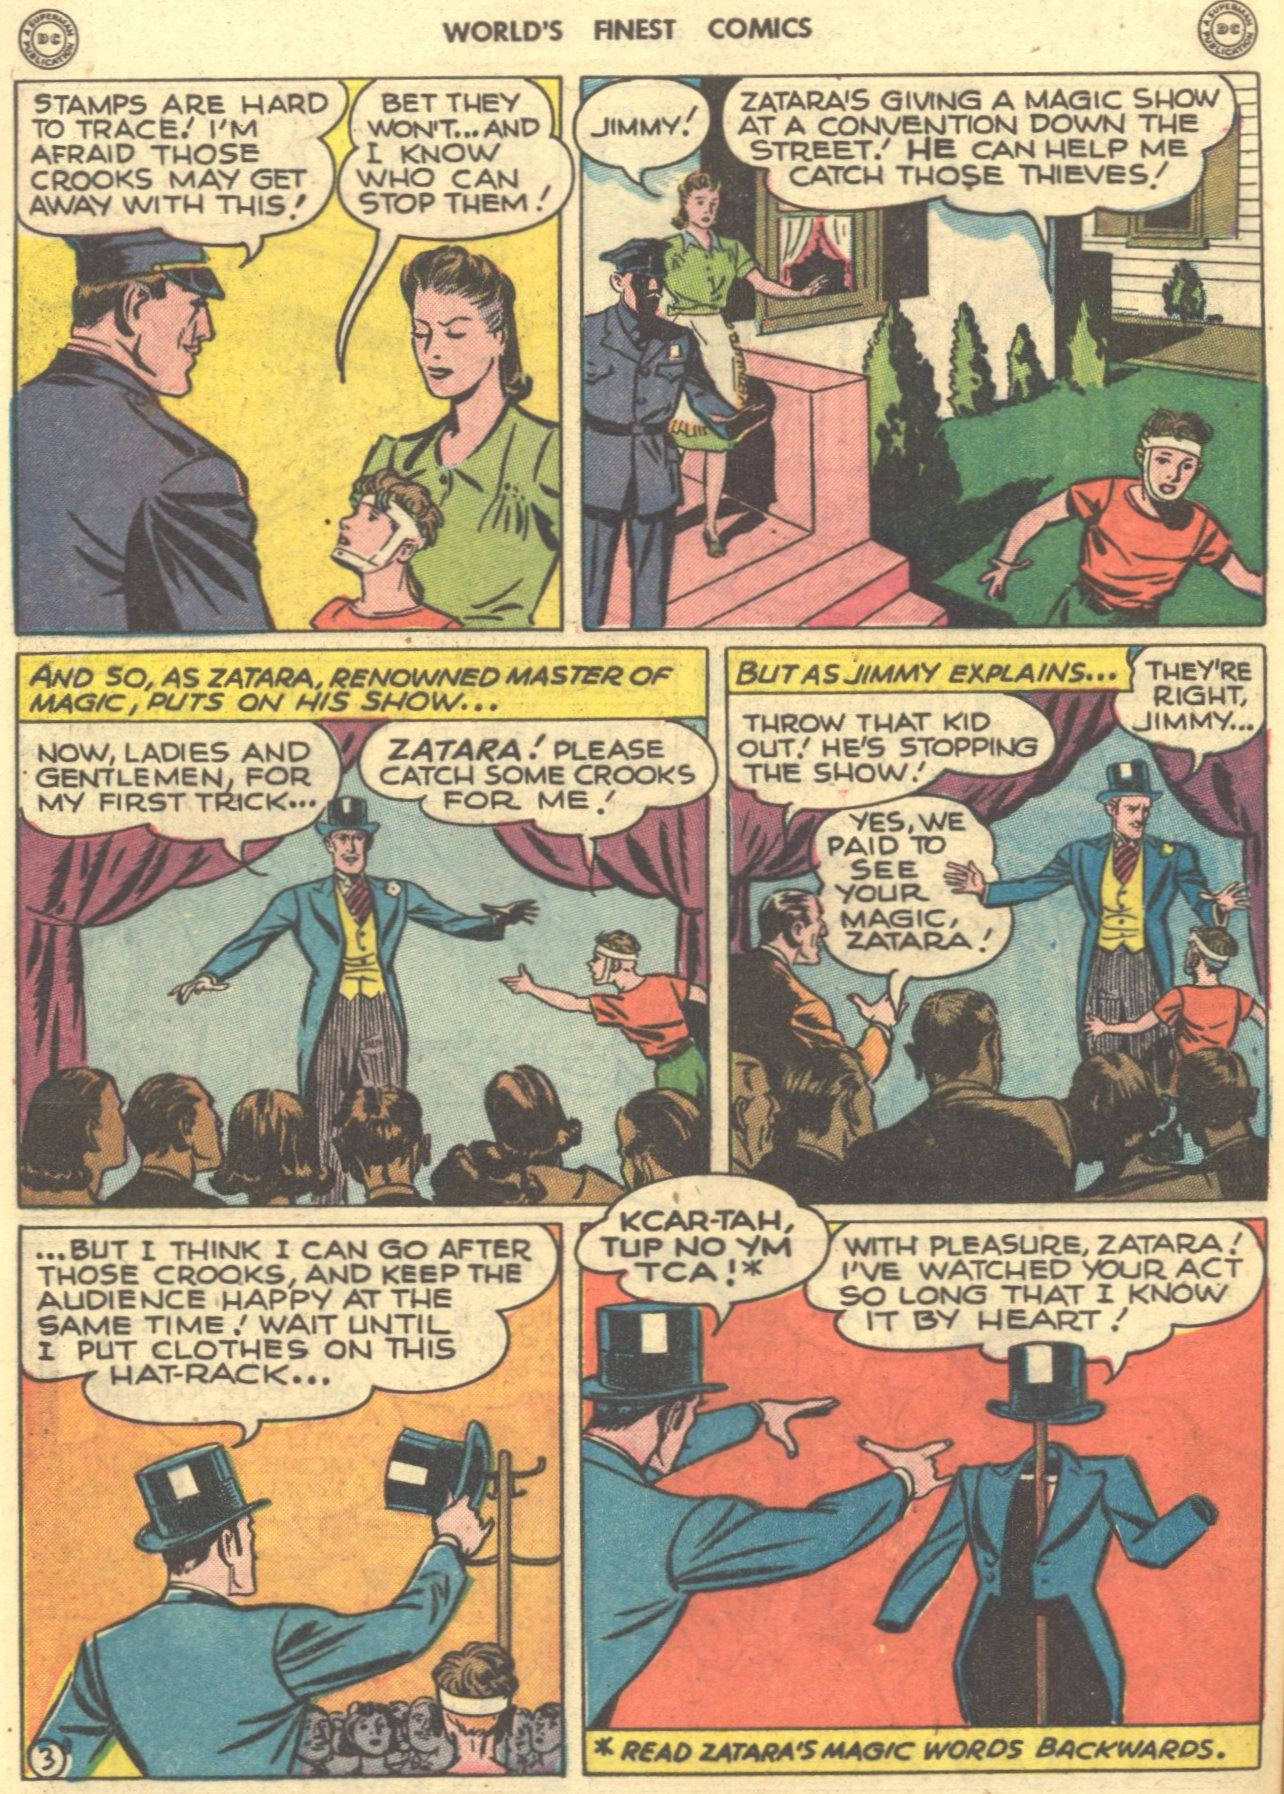 Read online World's Finest Comics comic -  Issue #28 - 45